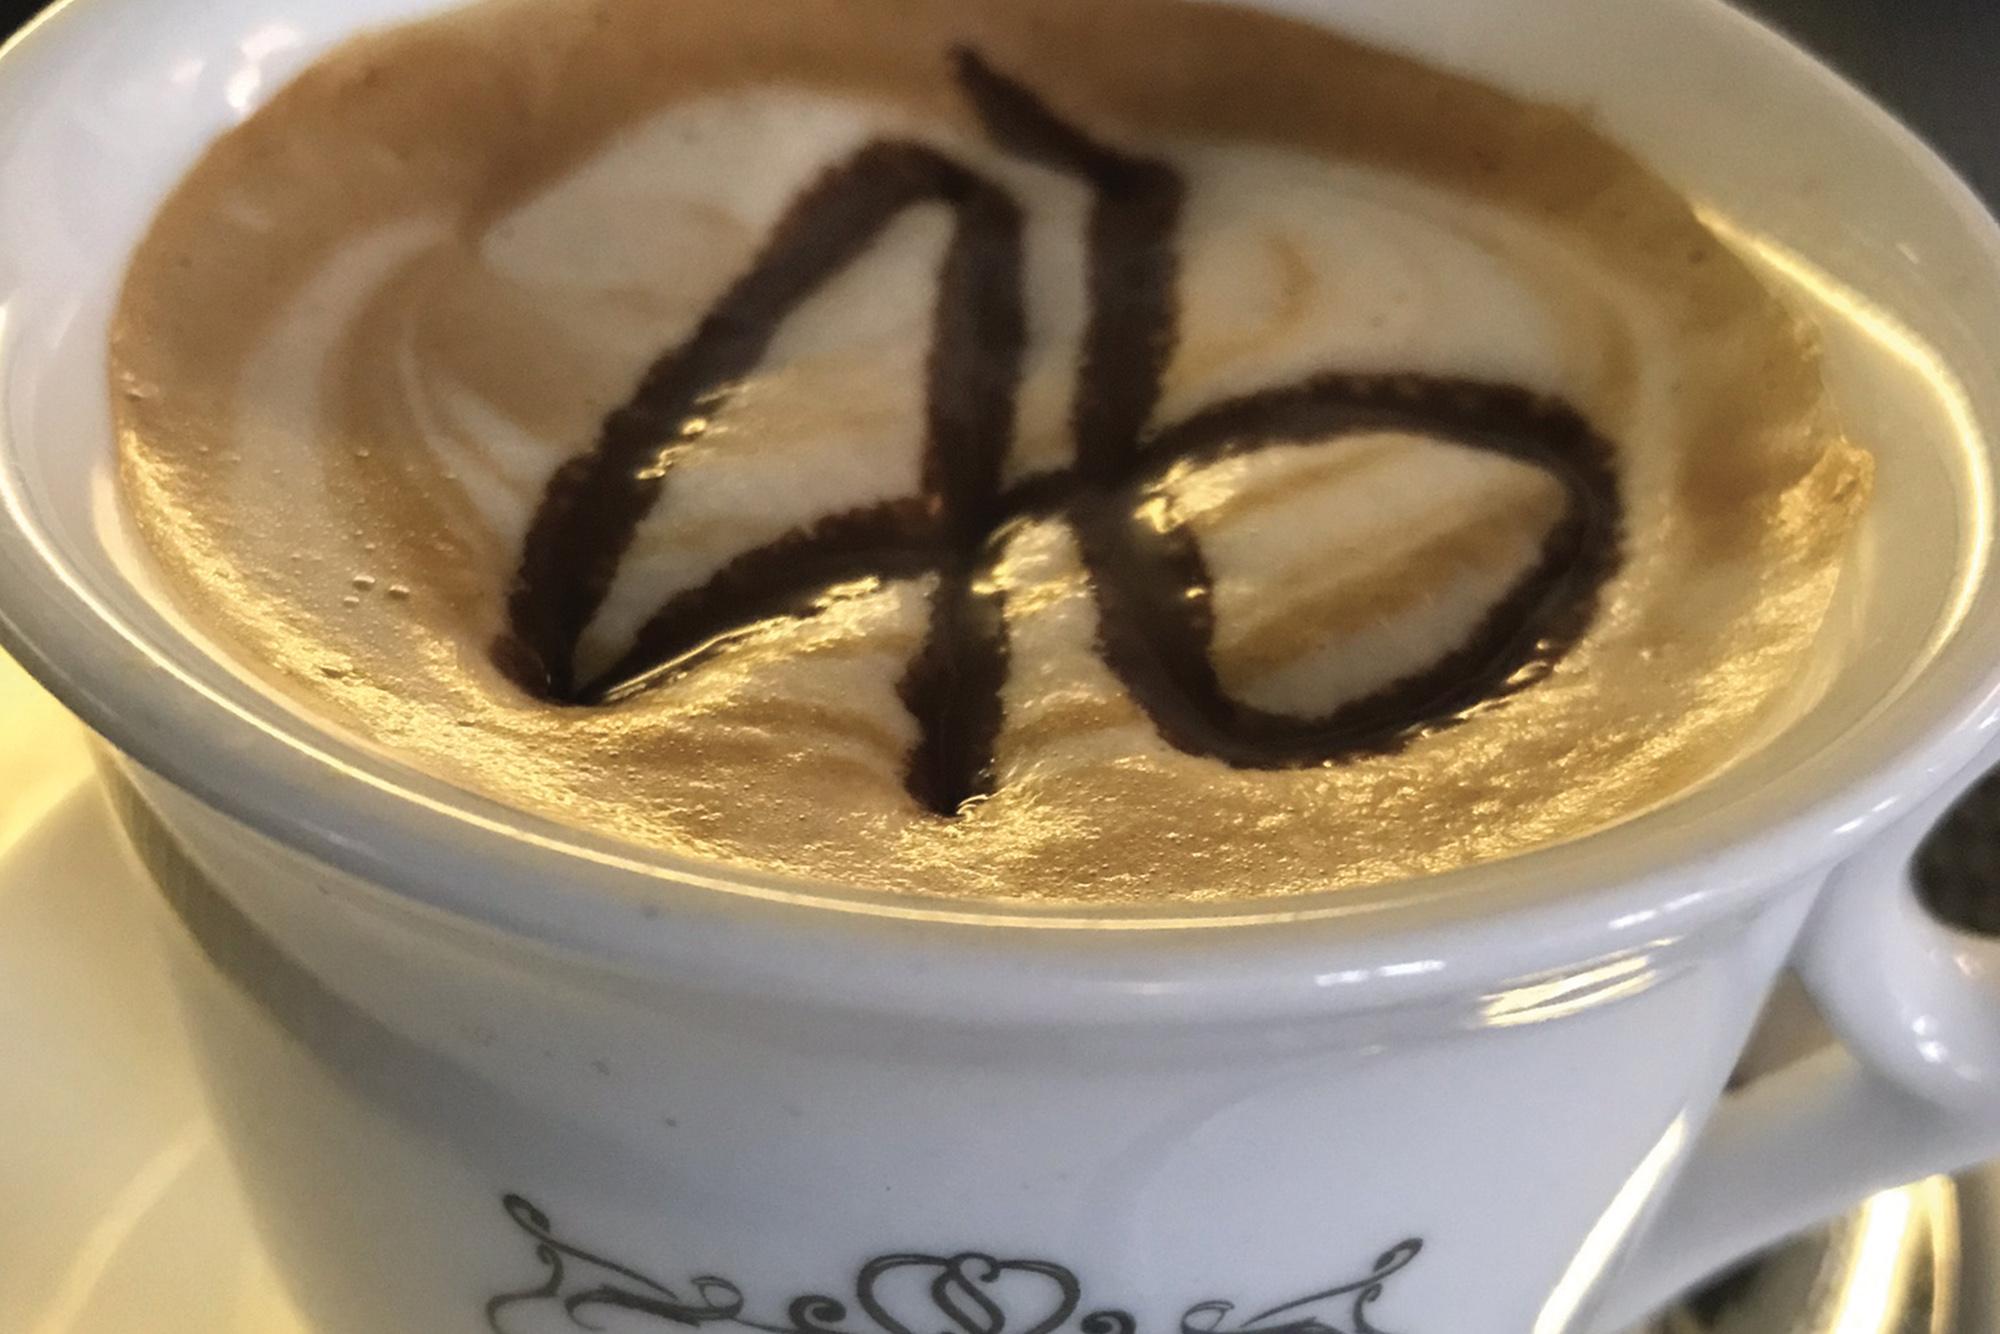 VR46 coffee